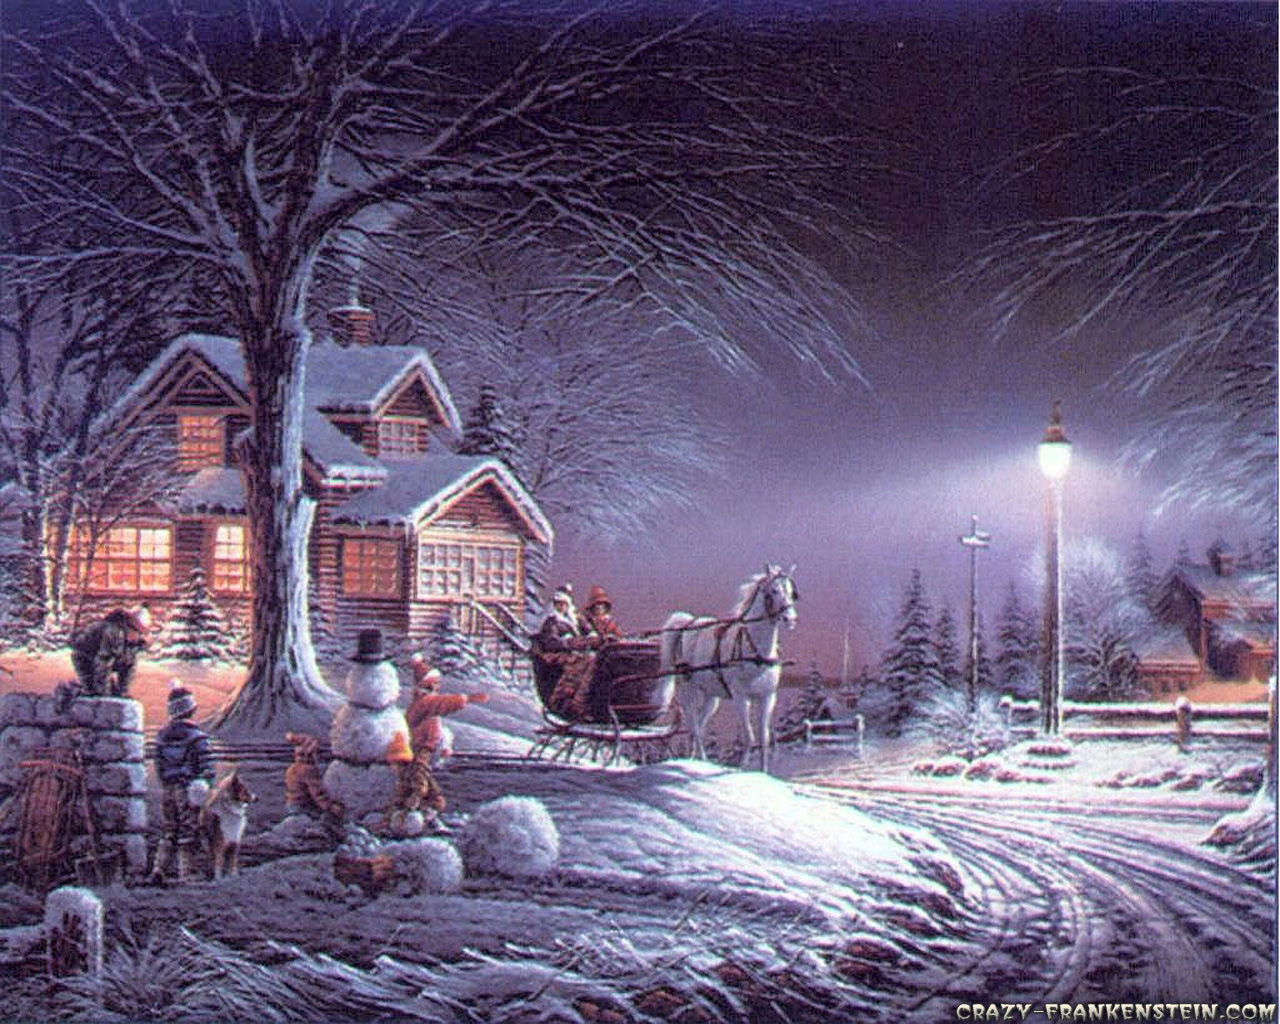 1280x1024px Old Fashioned Christmas Wallpaper - WallpaperSafari